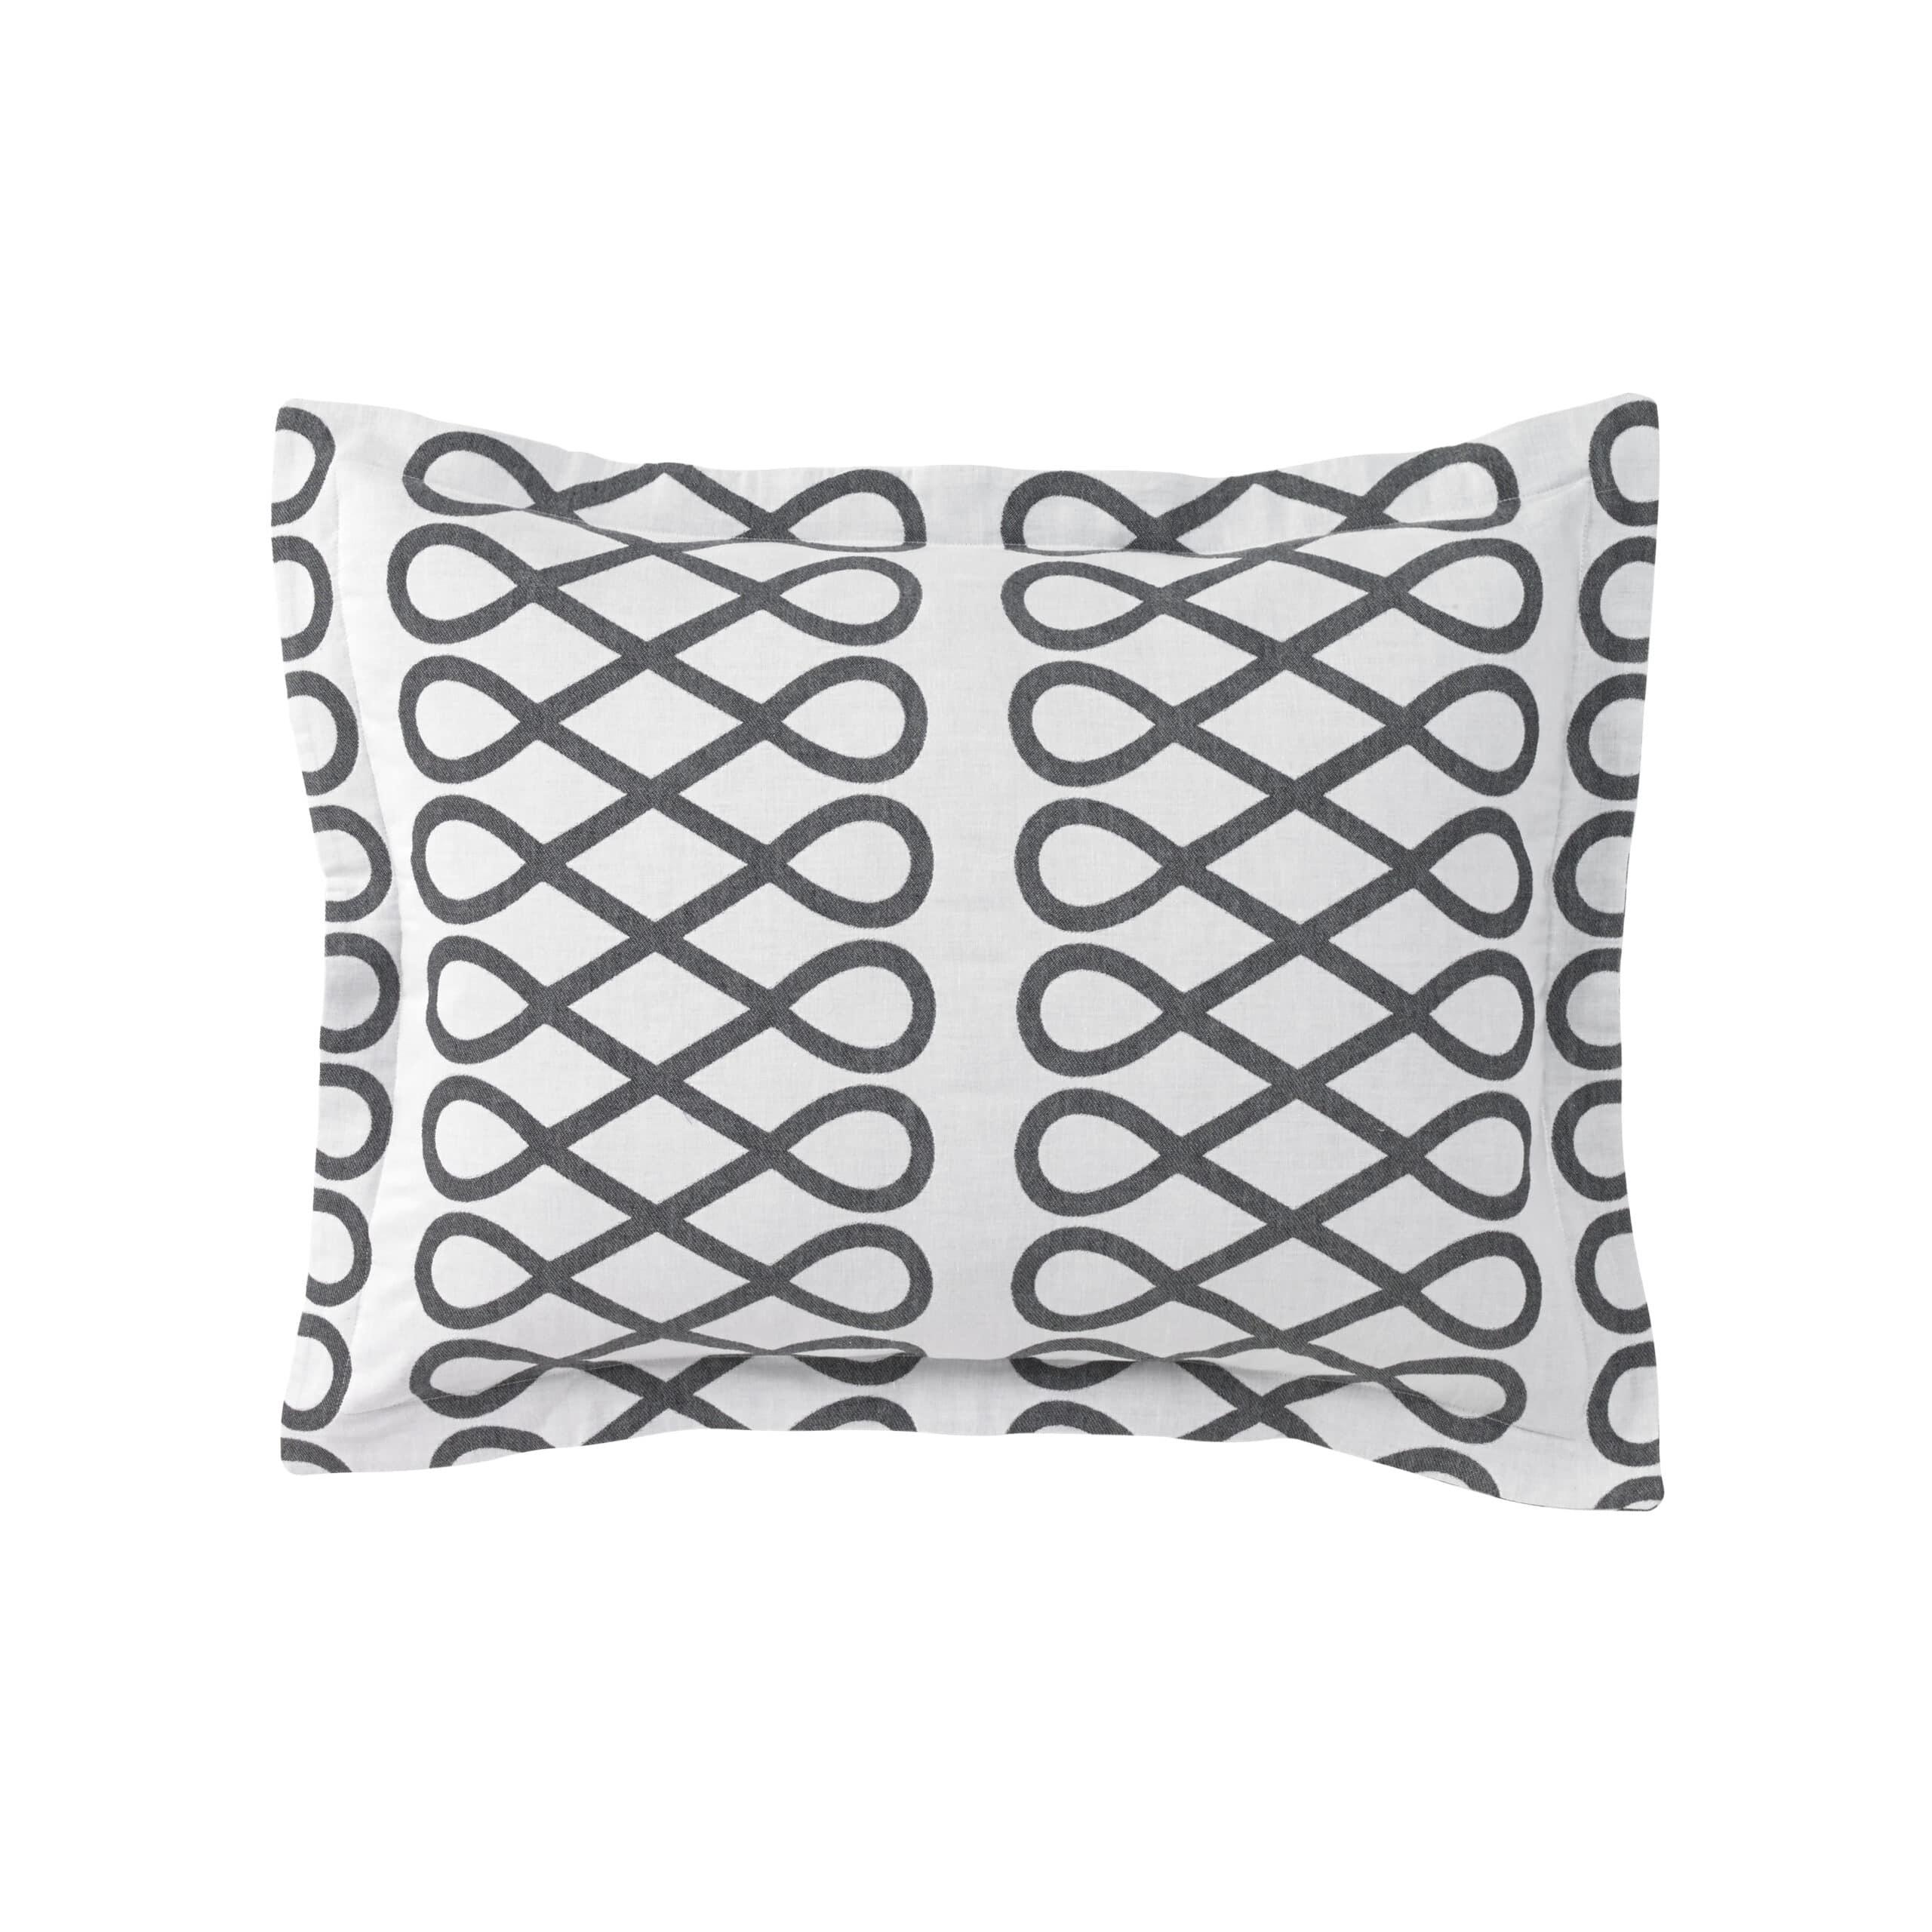 Loop-Ink-Sham-Pair-Standard_All-Modern-Bedding-Cococozy